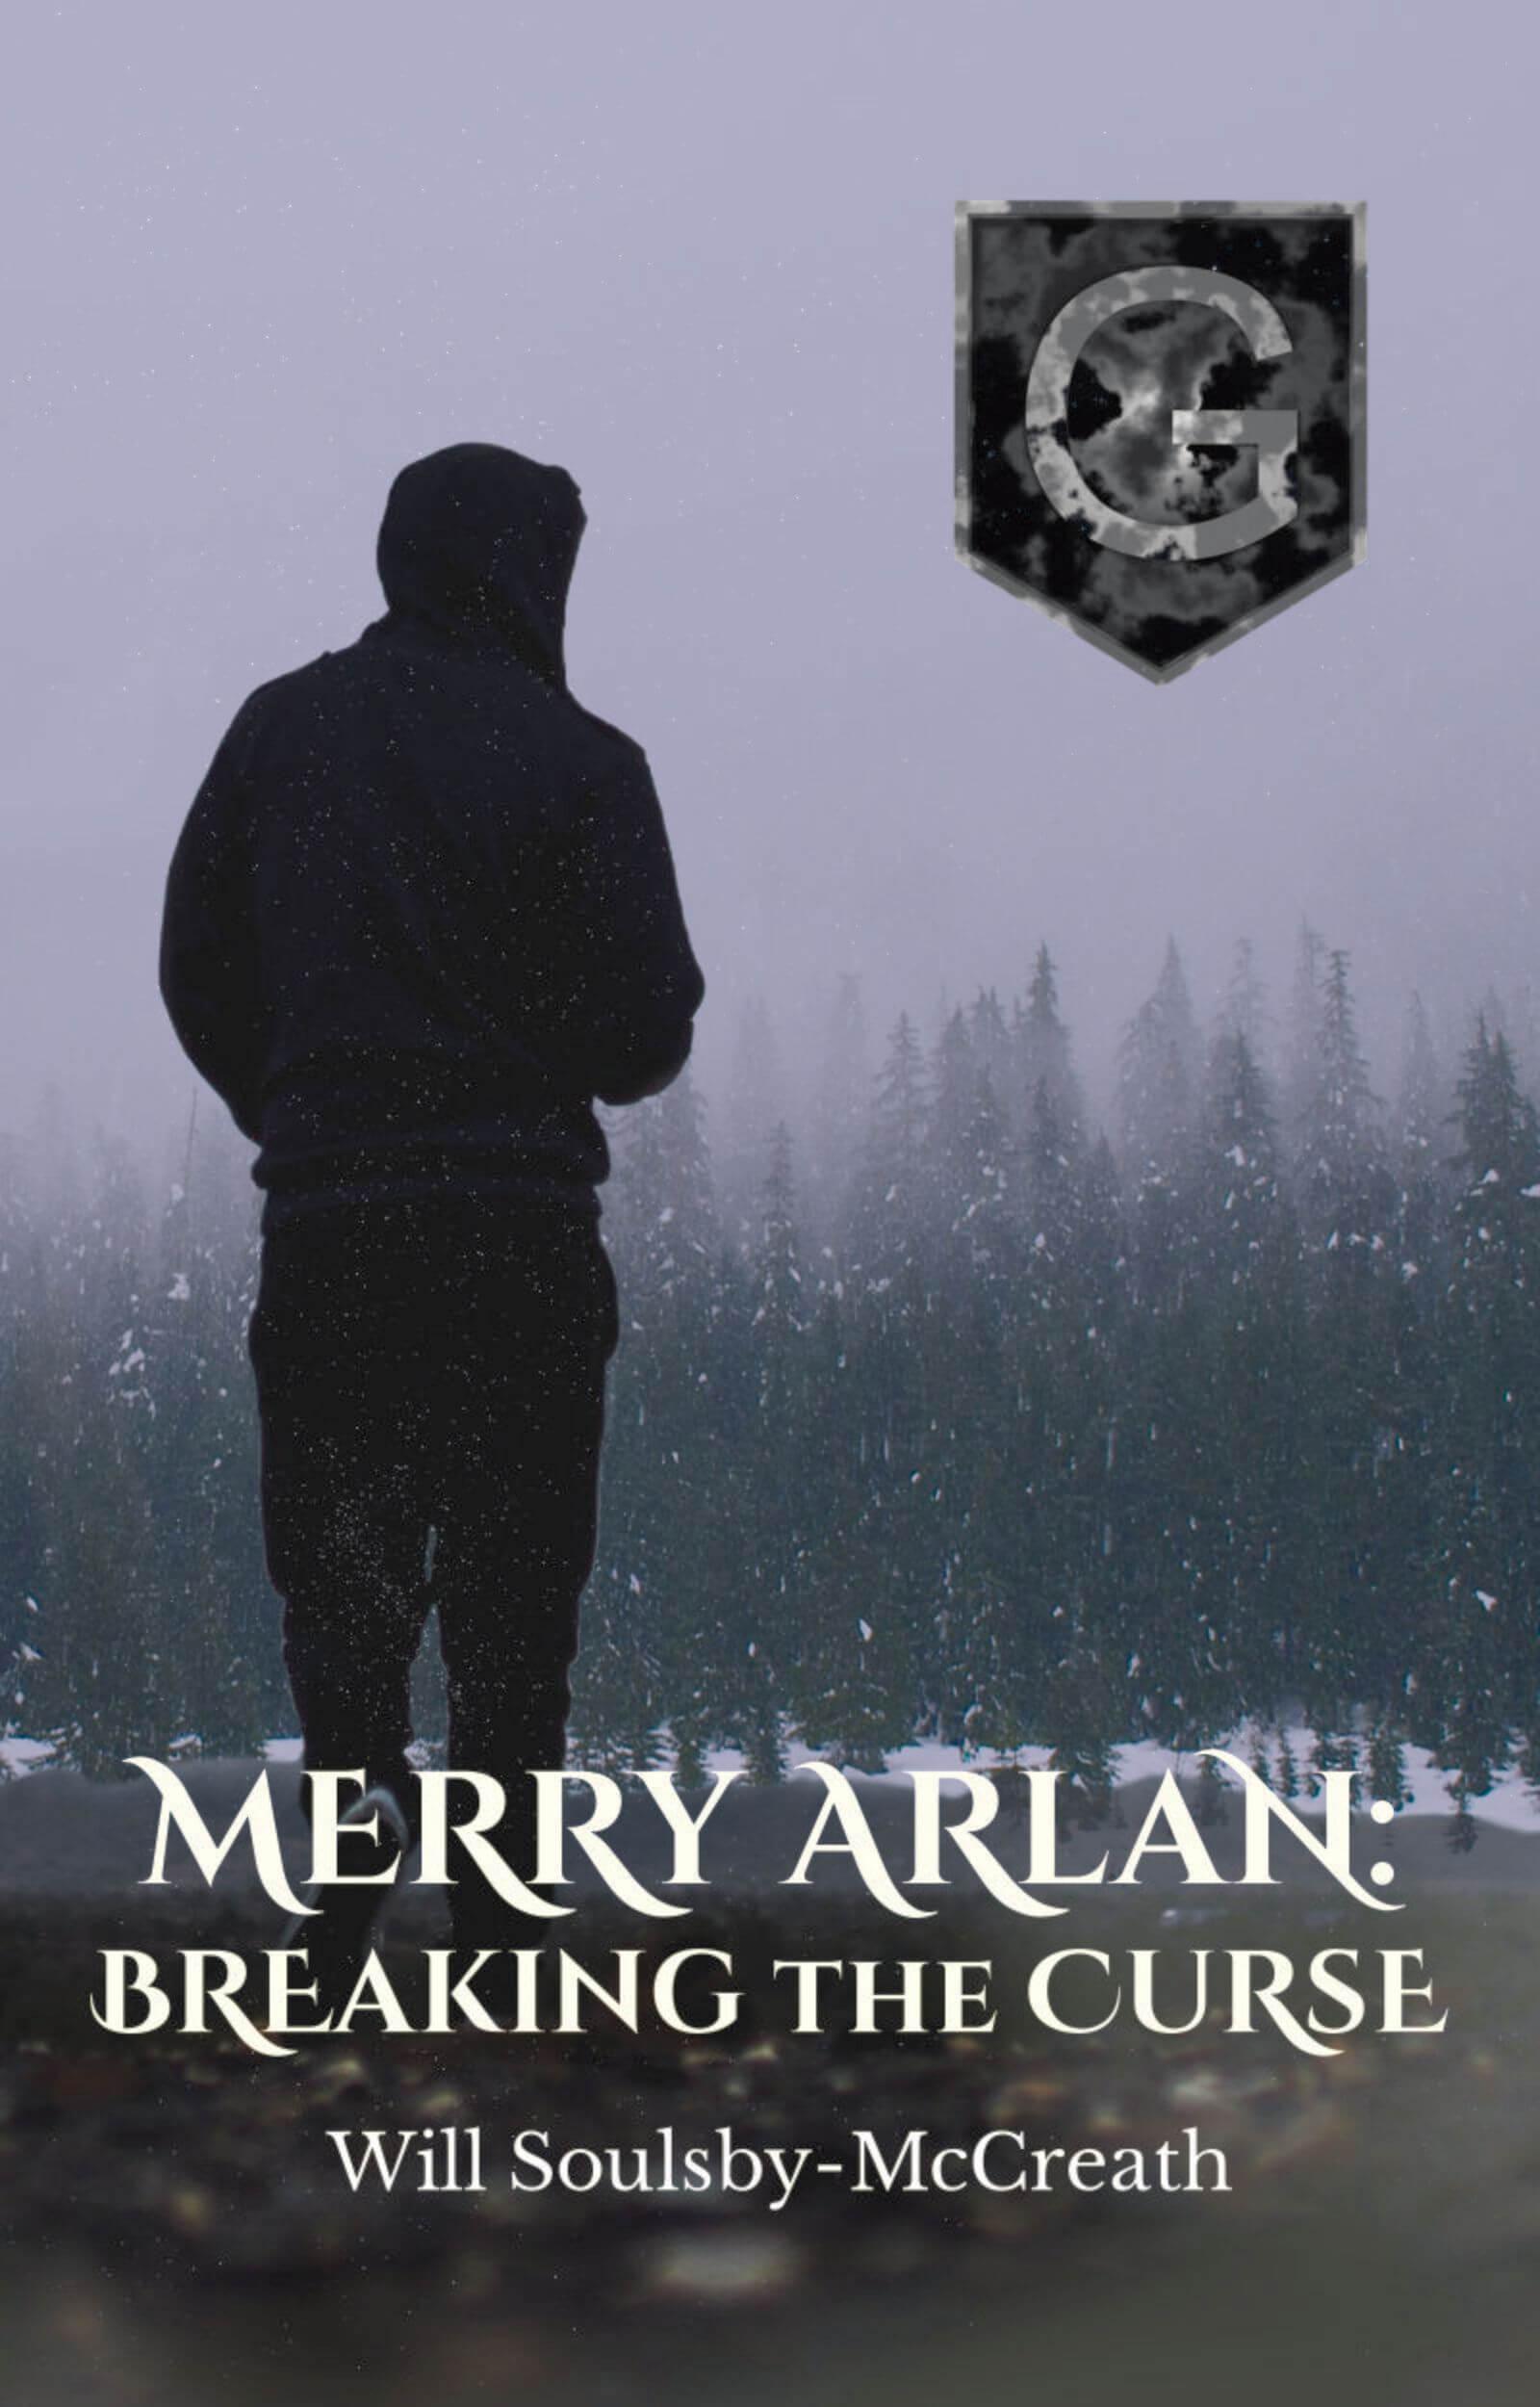 merry arlan breaking the curse will soulsby mccreath